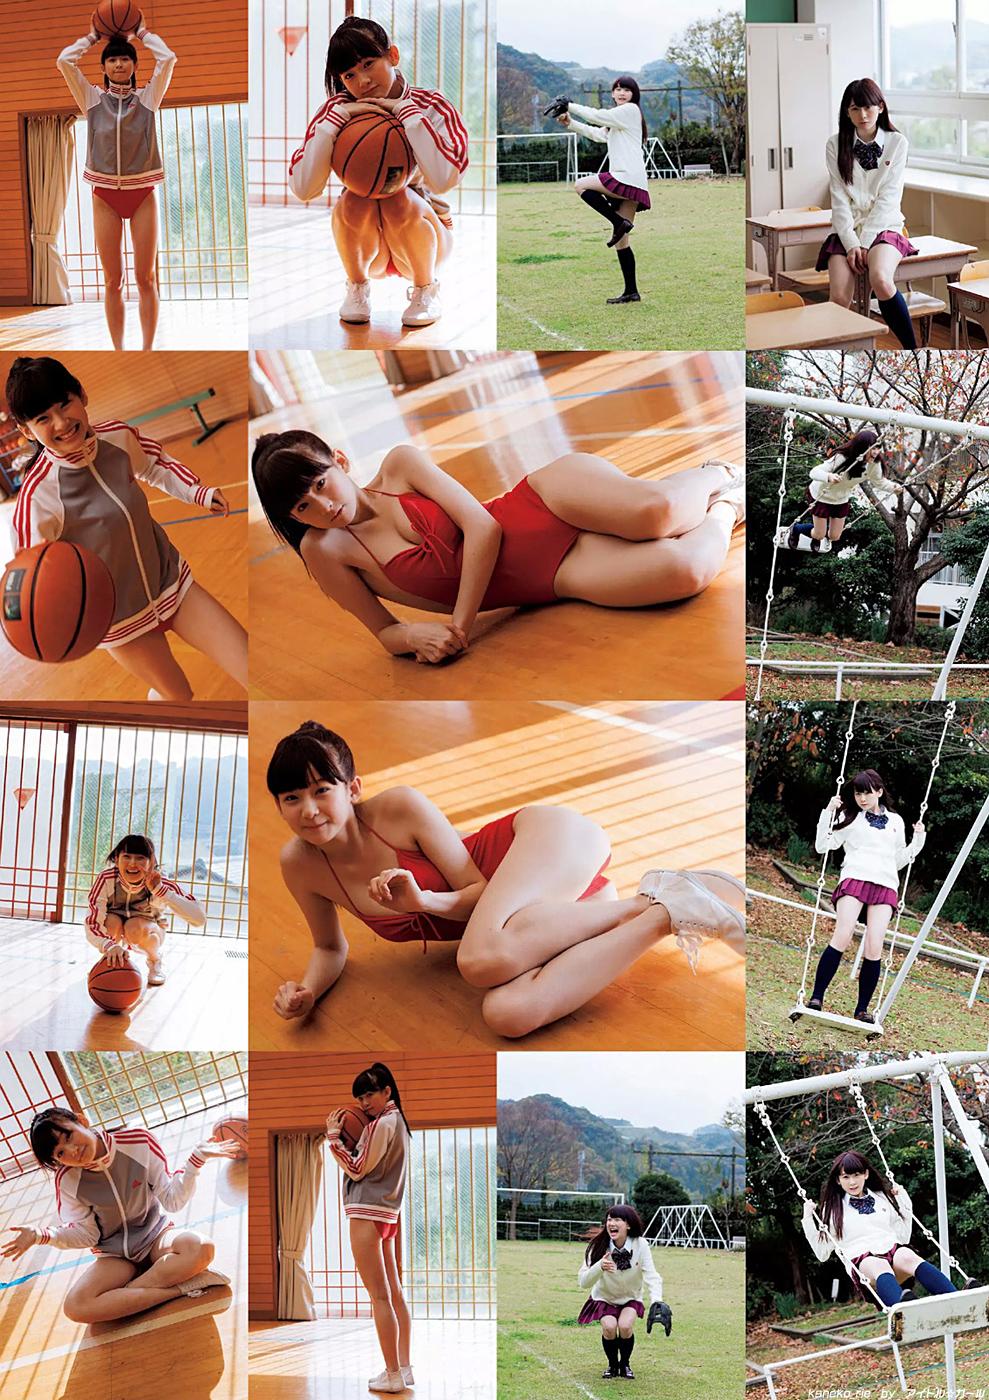 image http://scanlover.com/assets/images/47-WC7O8xVTDc66qTMh.jpeg